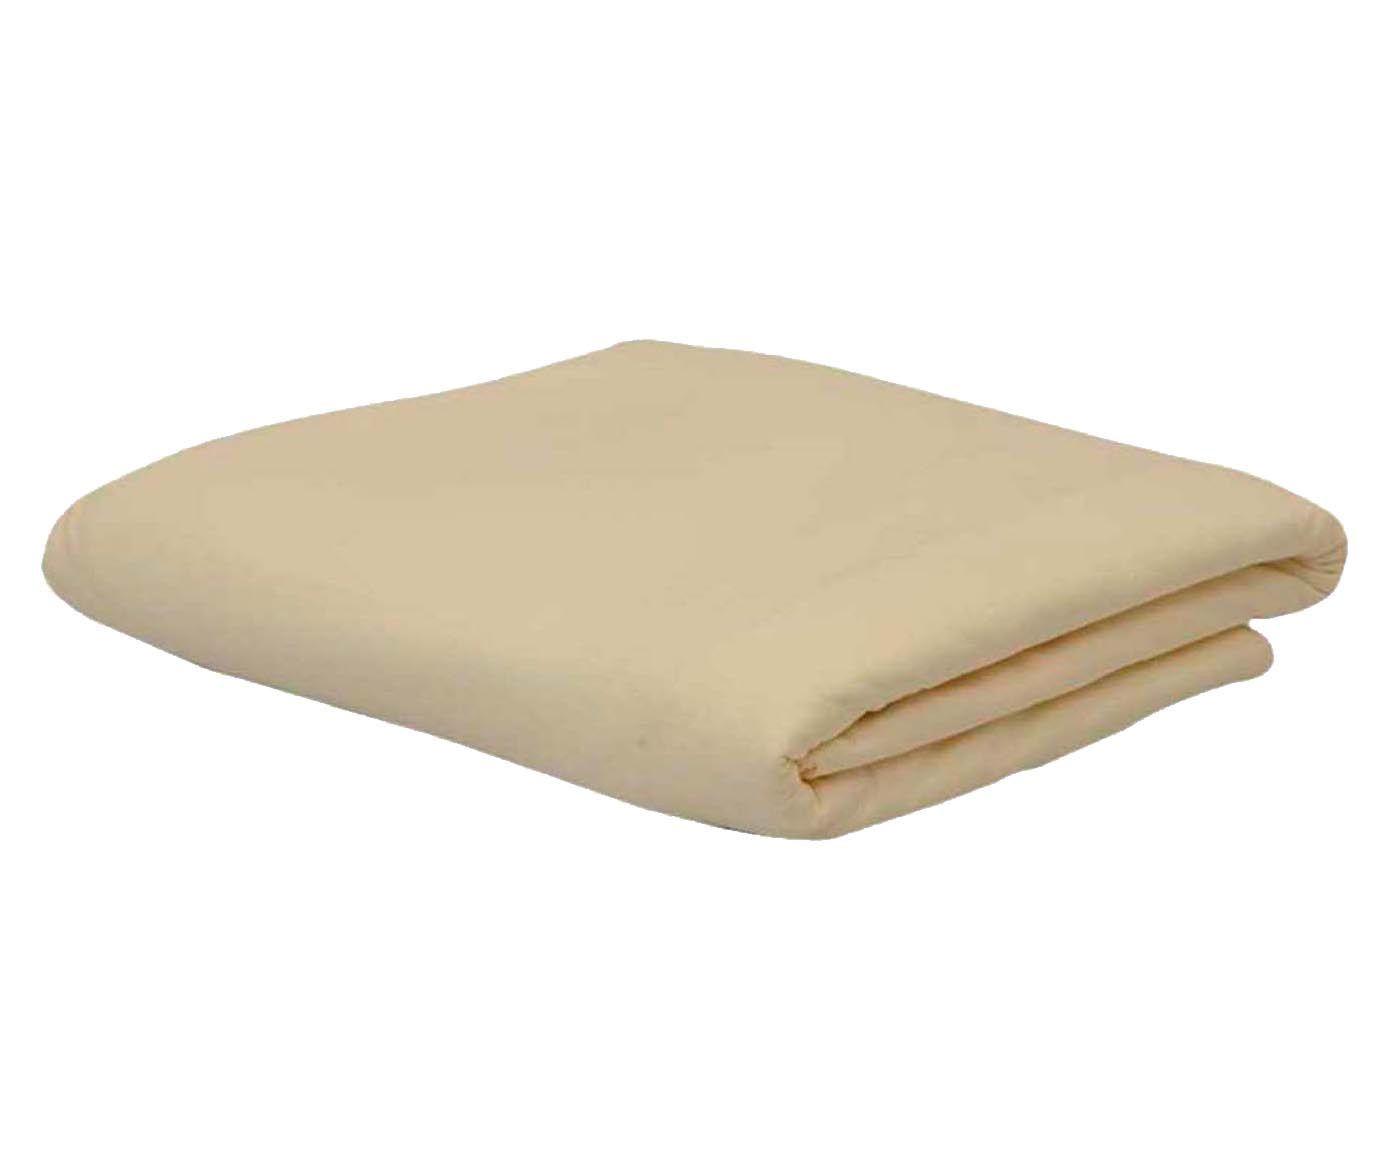 Lençol cosmos lana - para cama king size   Westwing.com.br